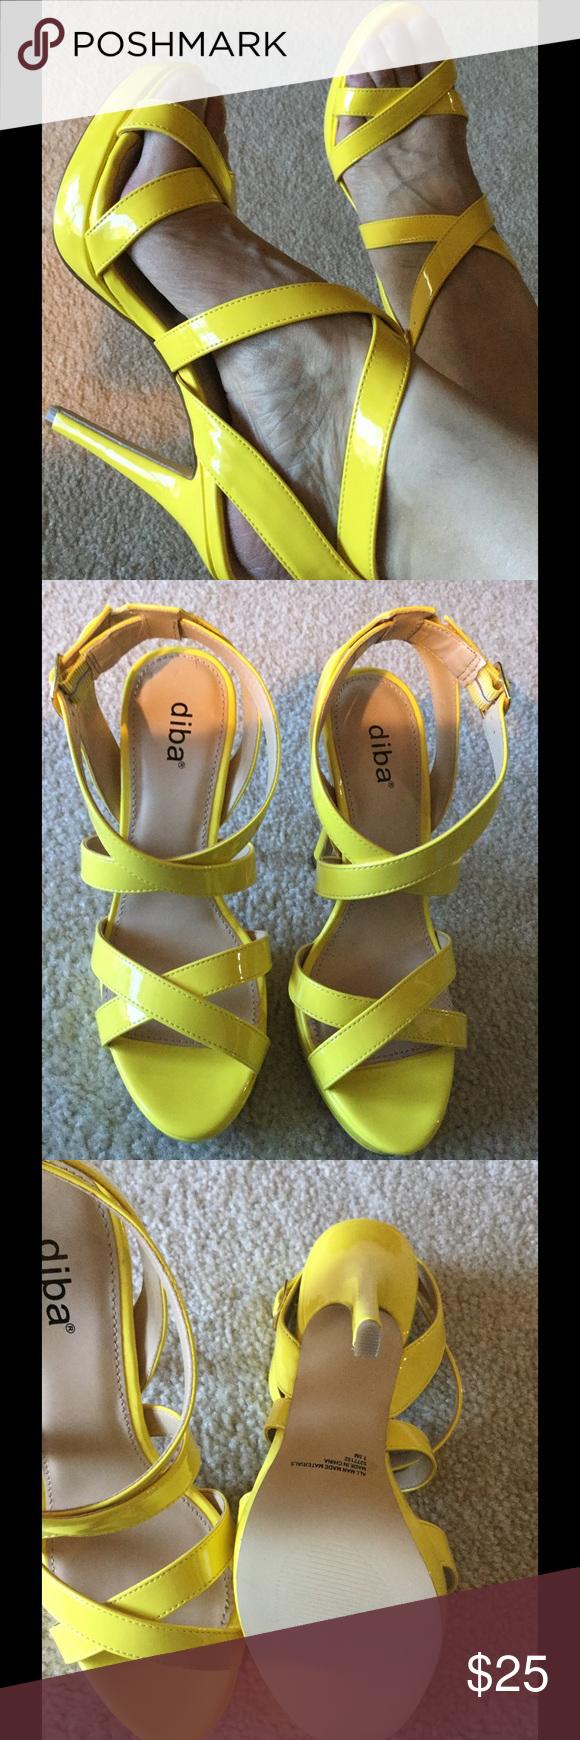 "Bright Yellow Sandals BNWOB LASYCHANCE Never worn, size 7.5, heel 5"" Diba Shoes Heels"